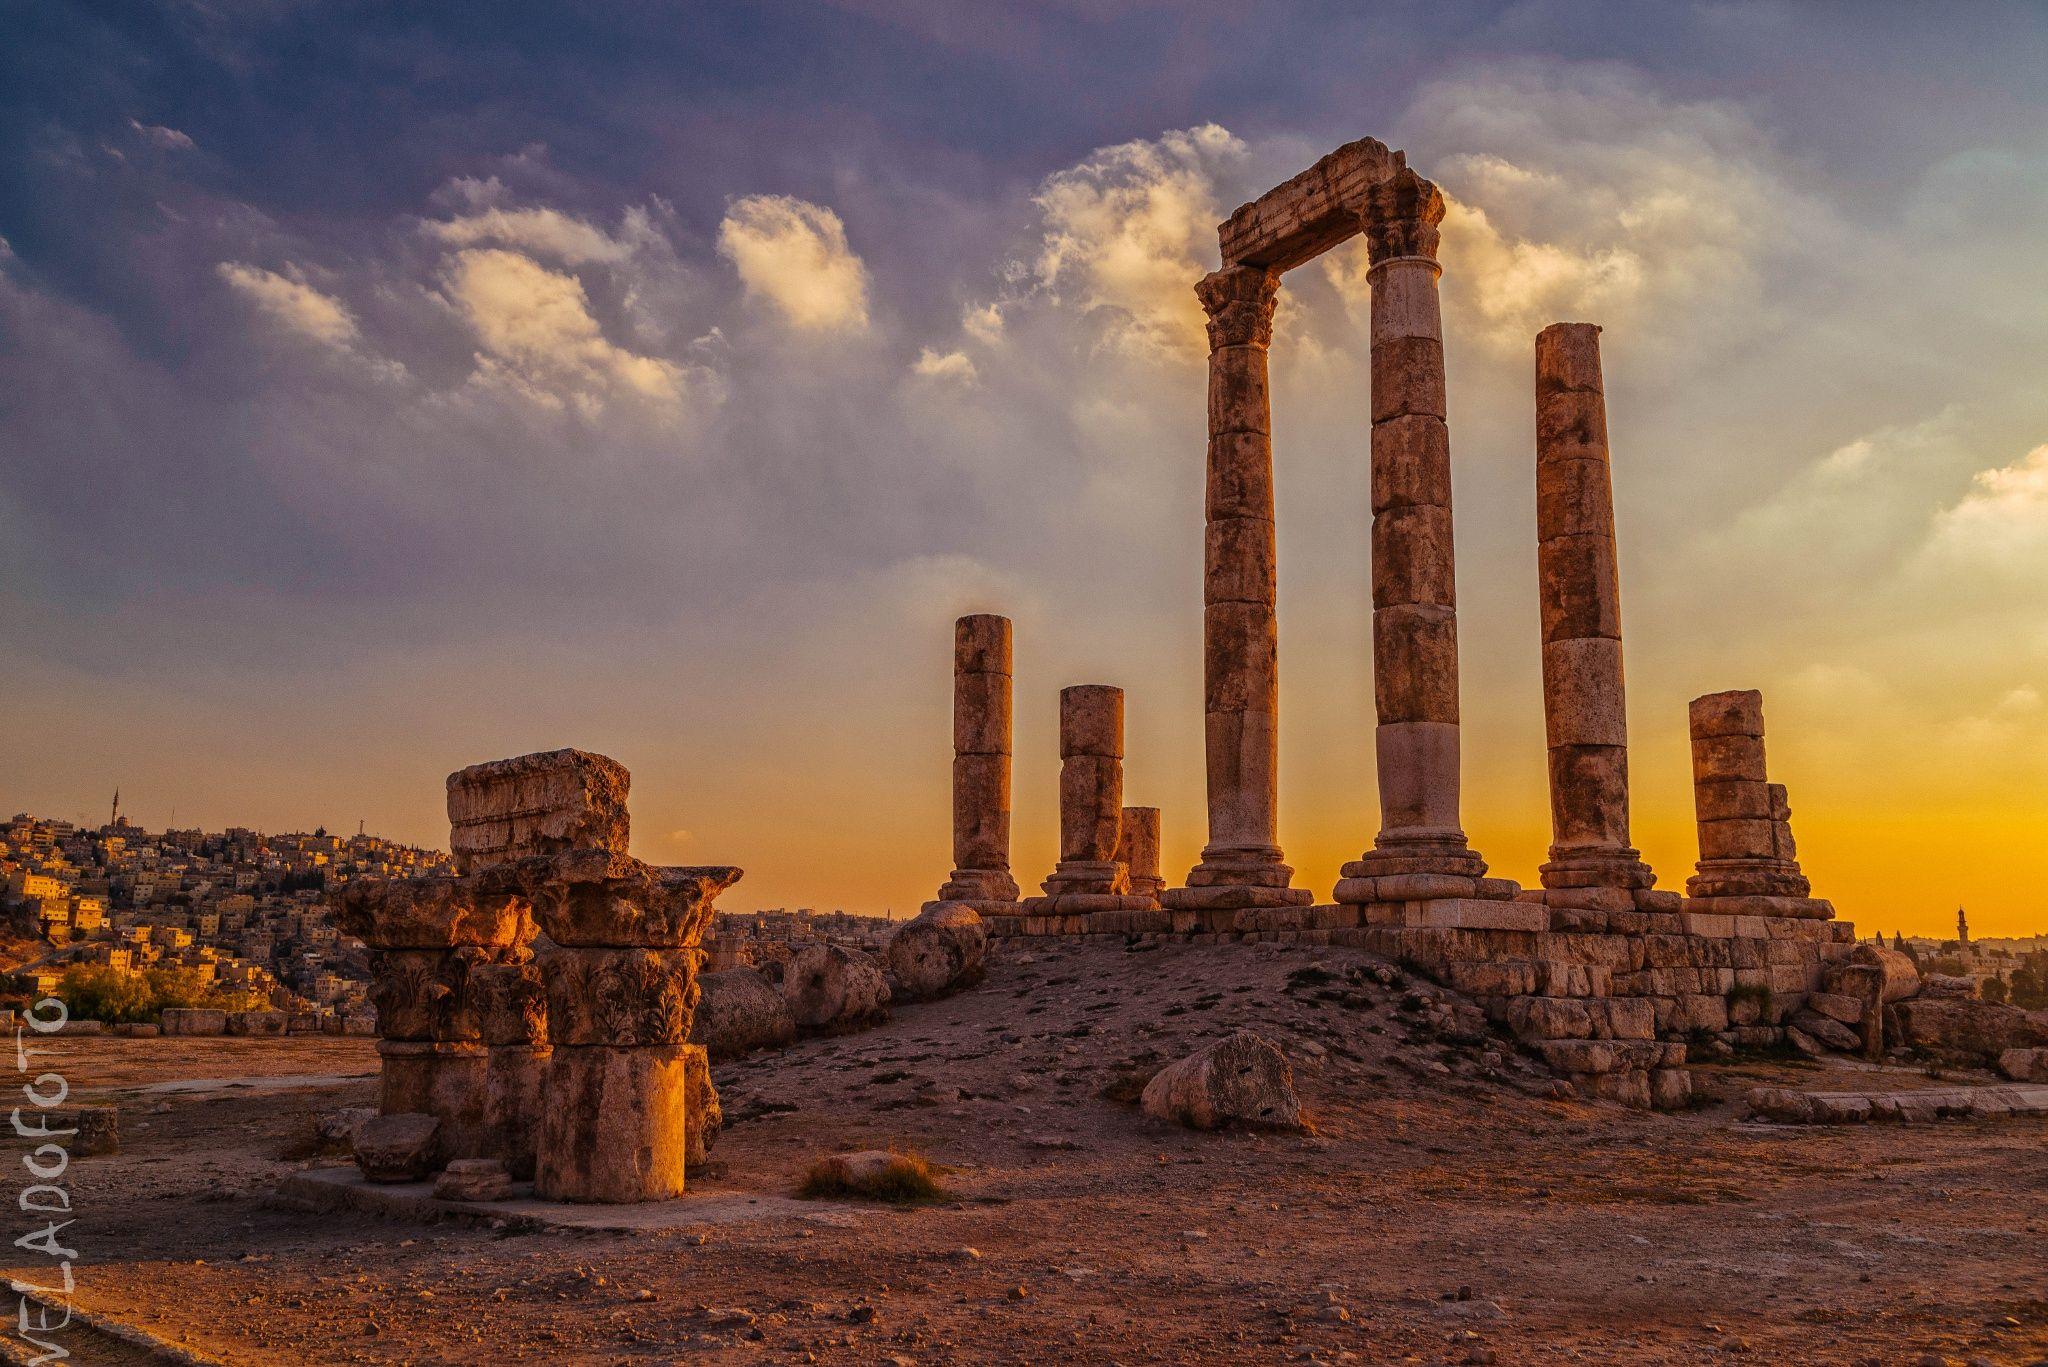 Amman (Templo de Hércules) - null